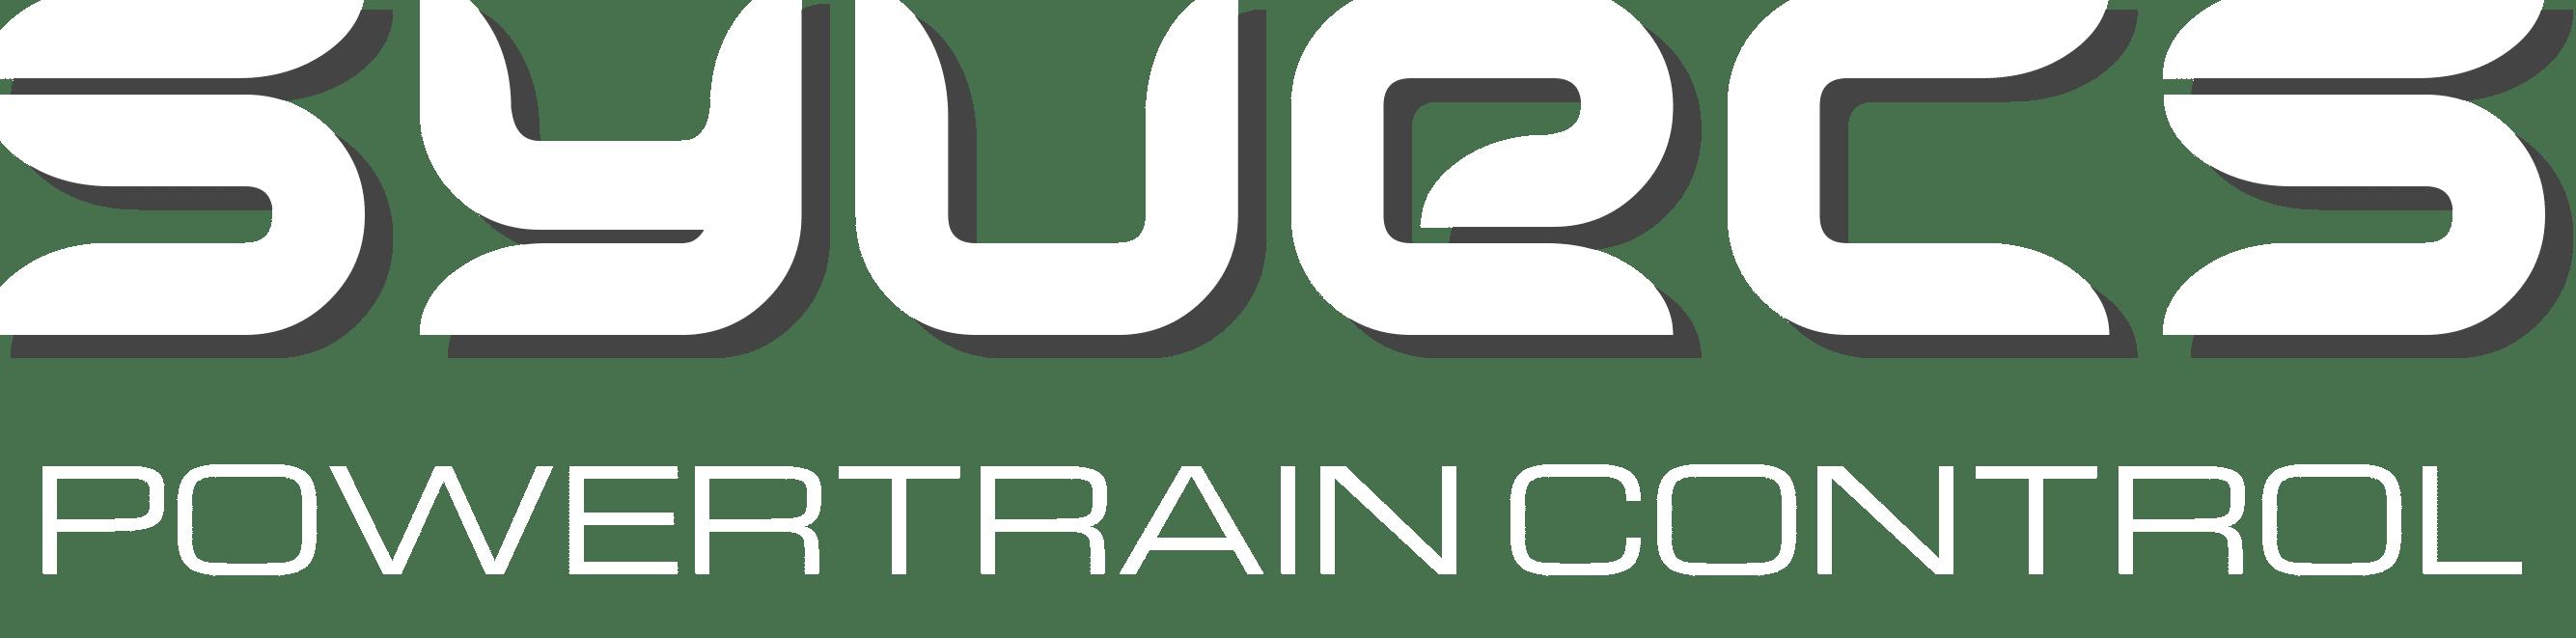 Cropped Syvecs Logo Light 1 Png Syvecs Powertrain Control